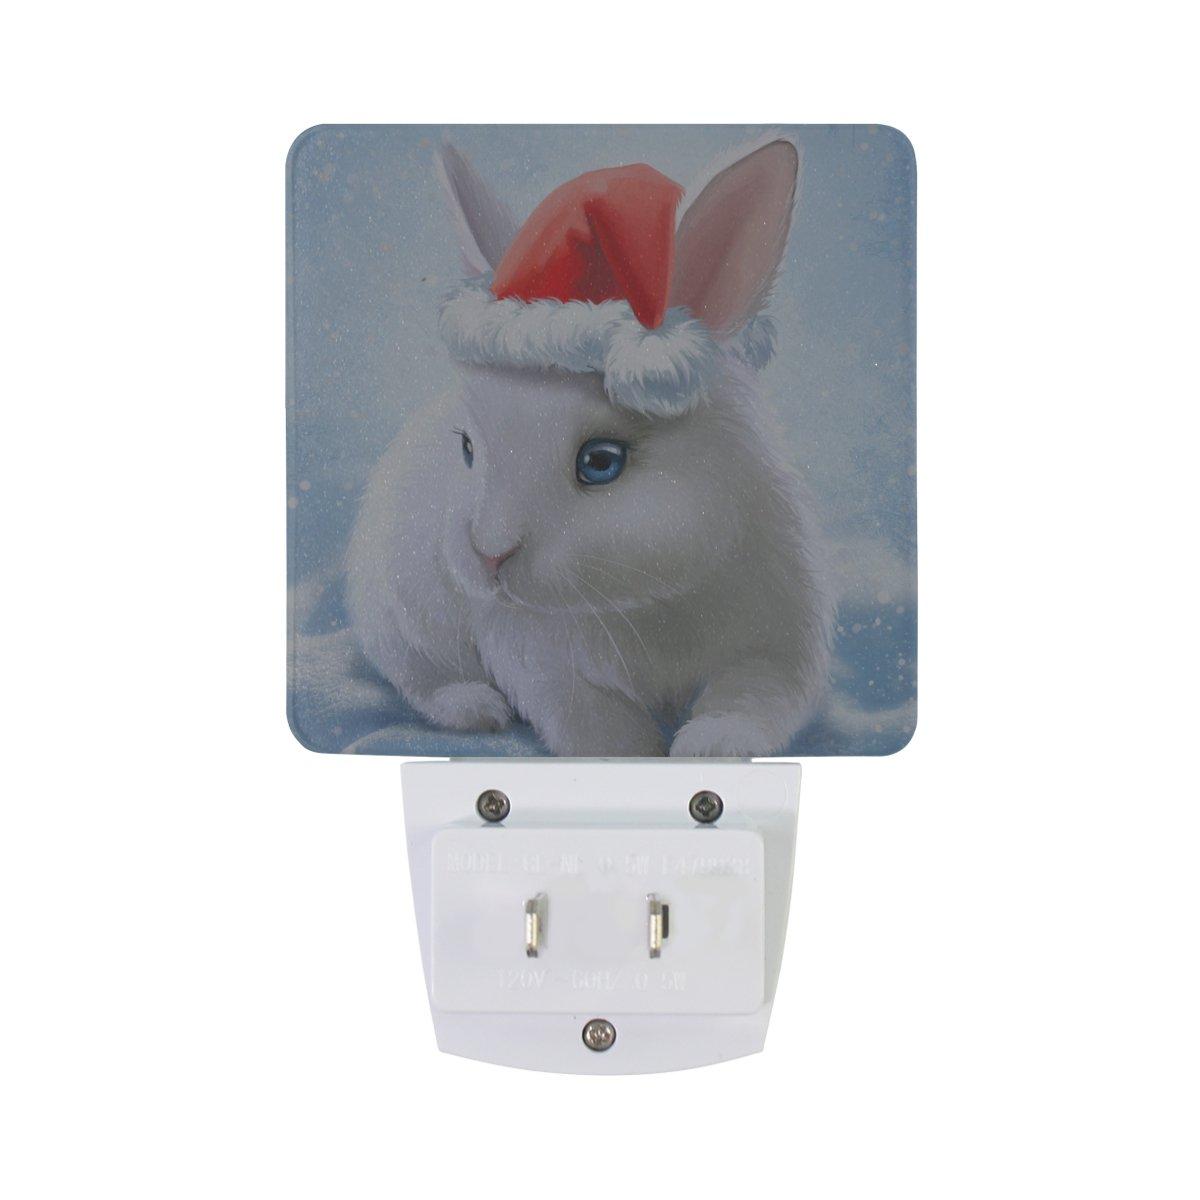 JOYPRINT Led Night Light Cute Animal Rabbit Bunny, Auto Senor Dusk to Dawn Night Light Plug in for Kids Baby Girls Boys Adults Room by JOYPRINT (Image #2)